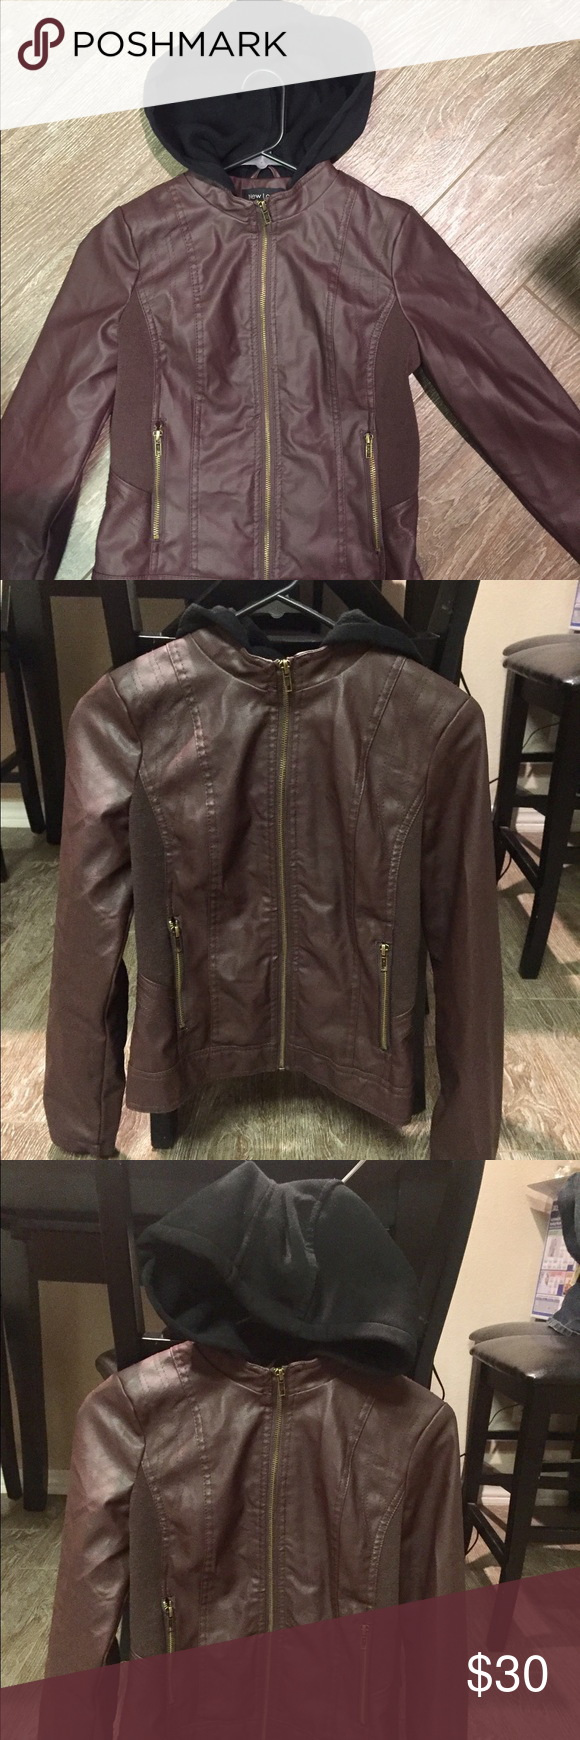 Leather jacket NWOT Brownish/Burgundy hooded leather